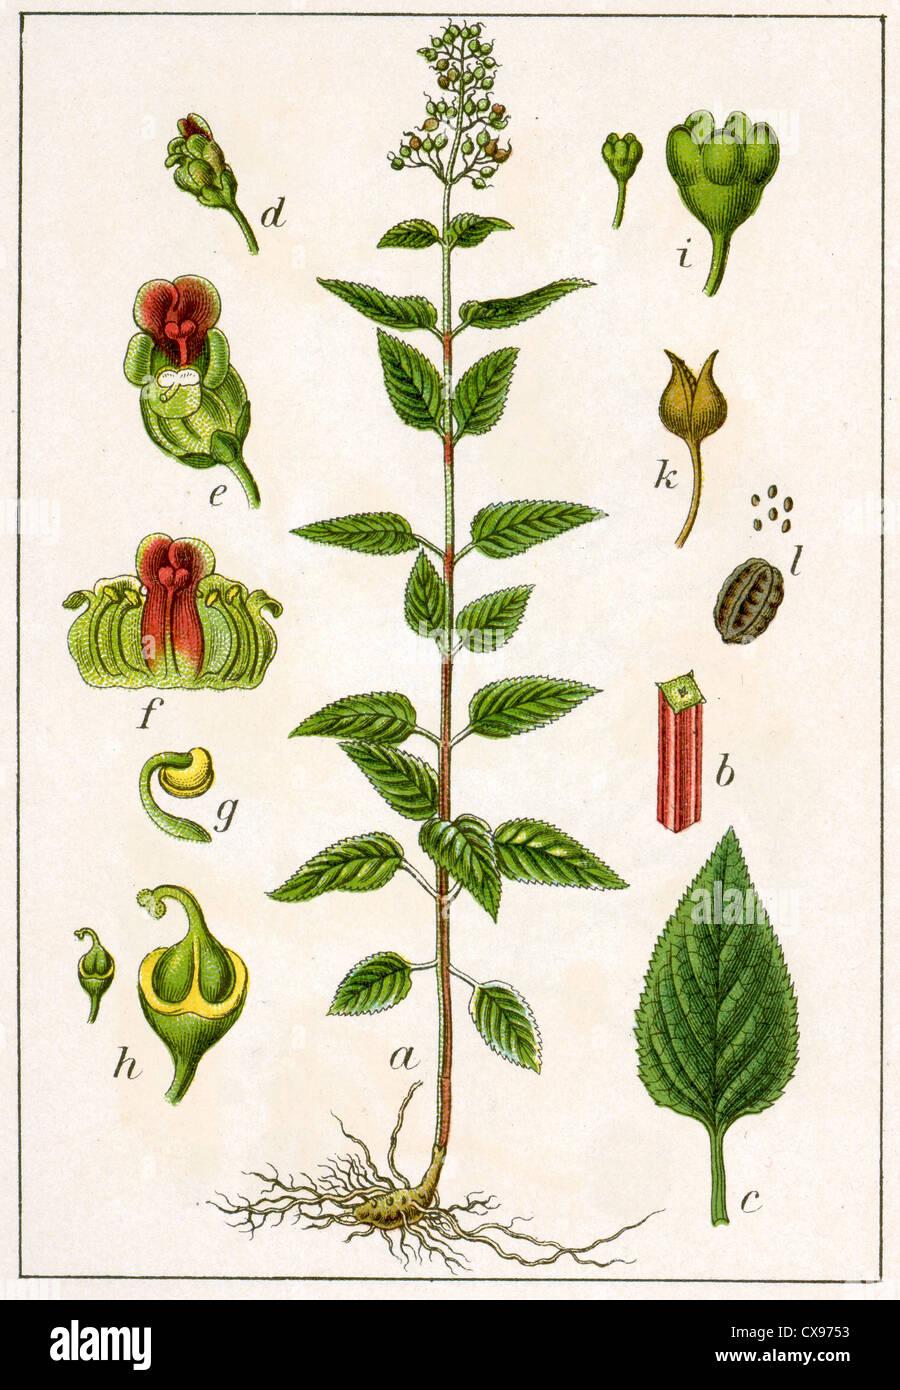 Scrofularia nodosa - Stock Image